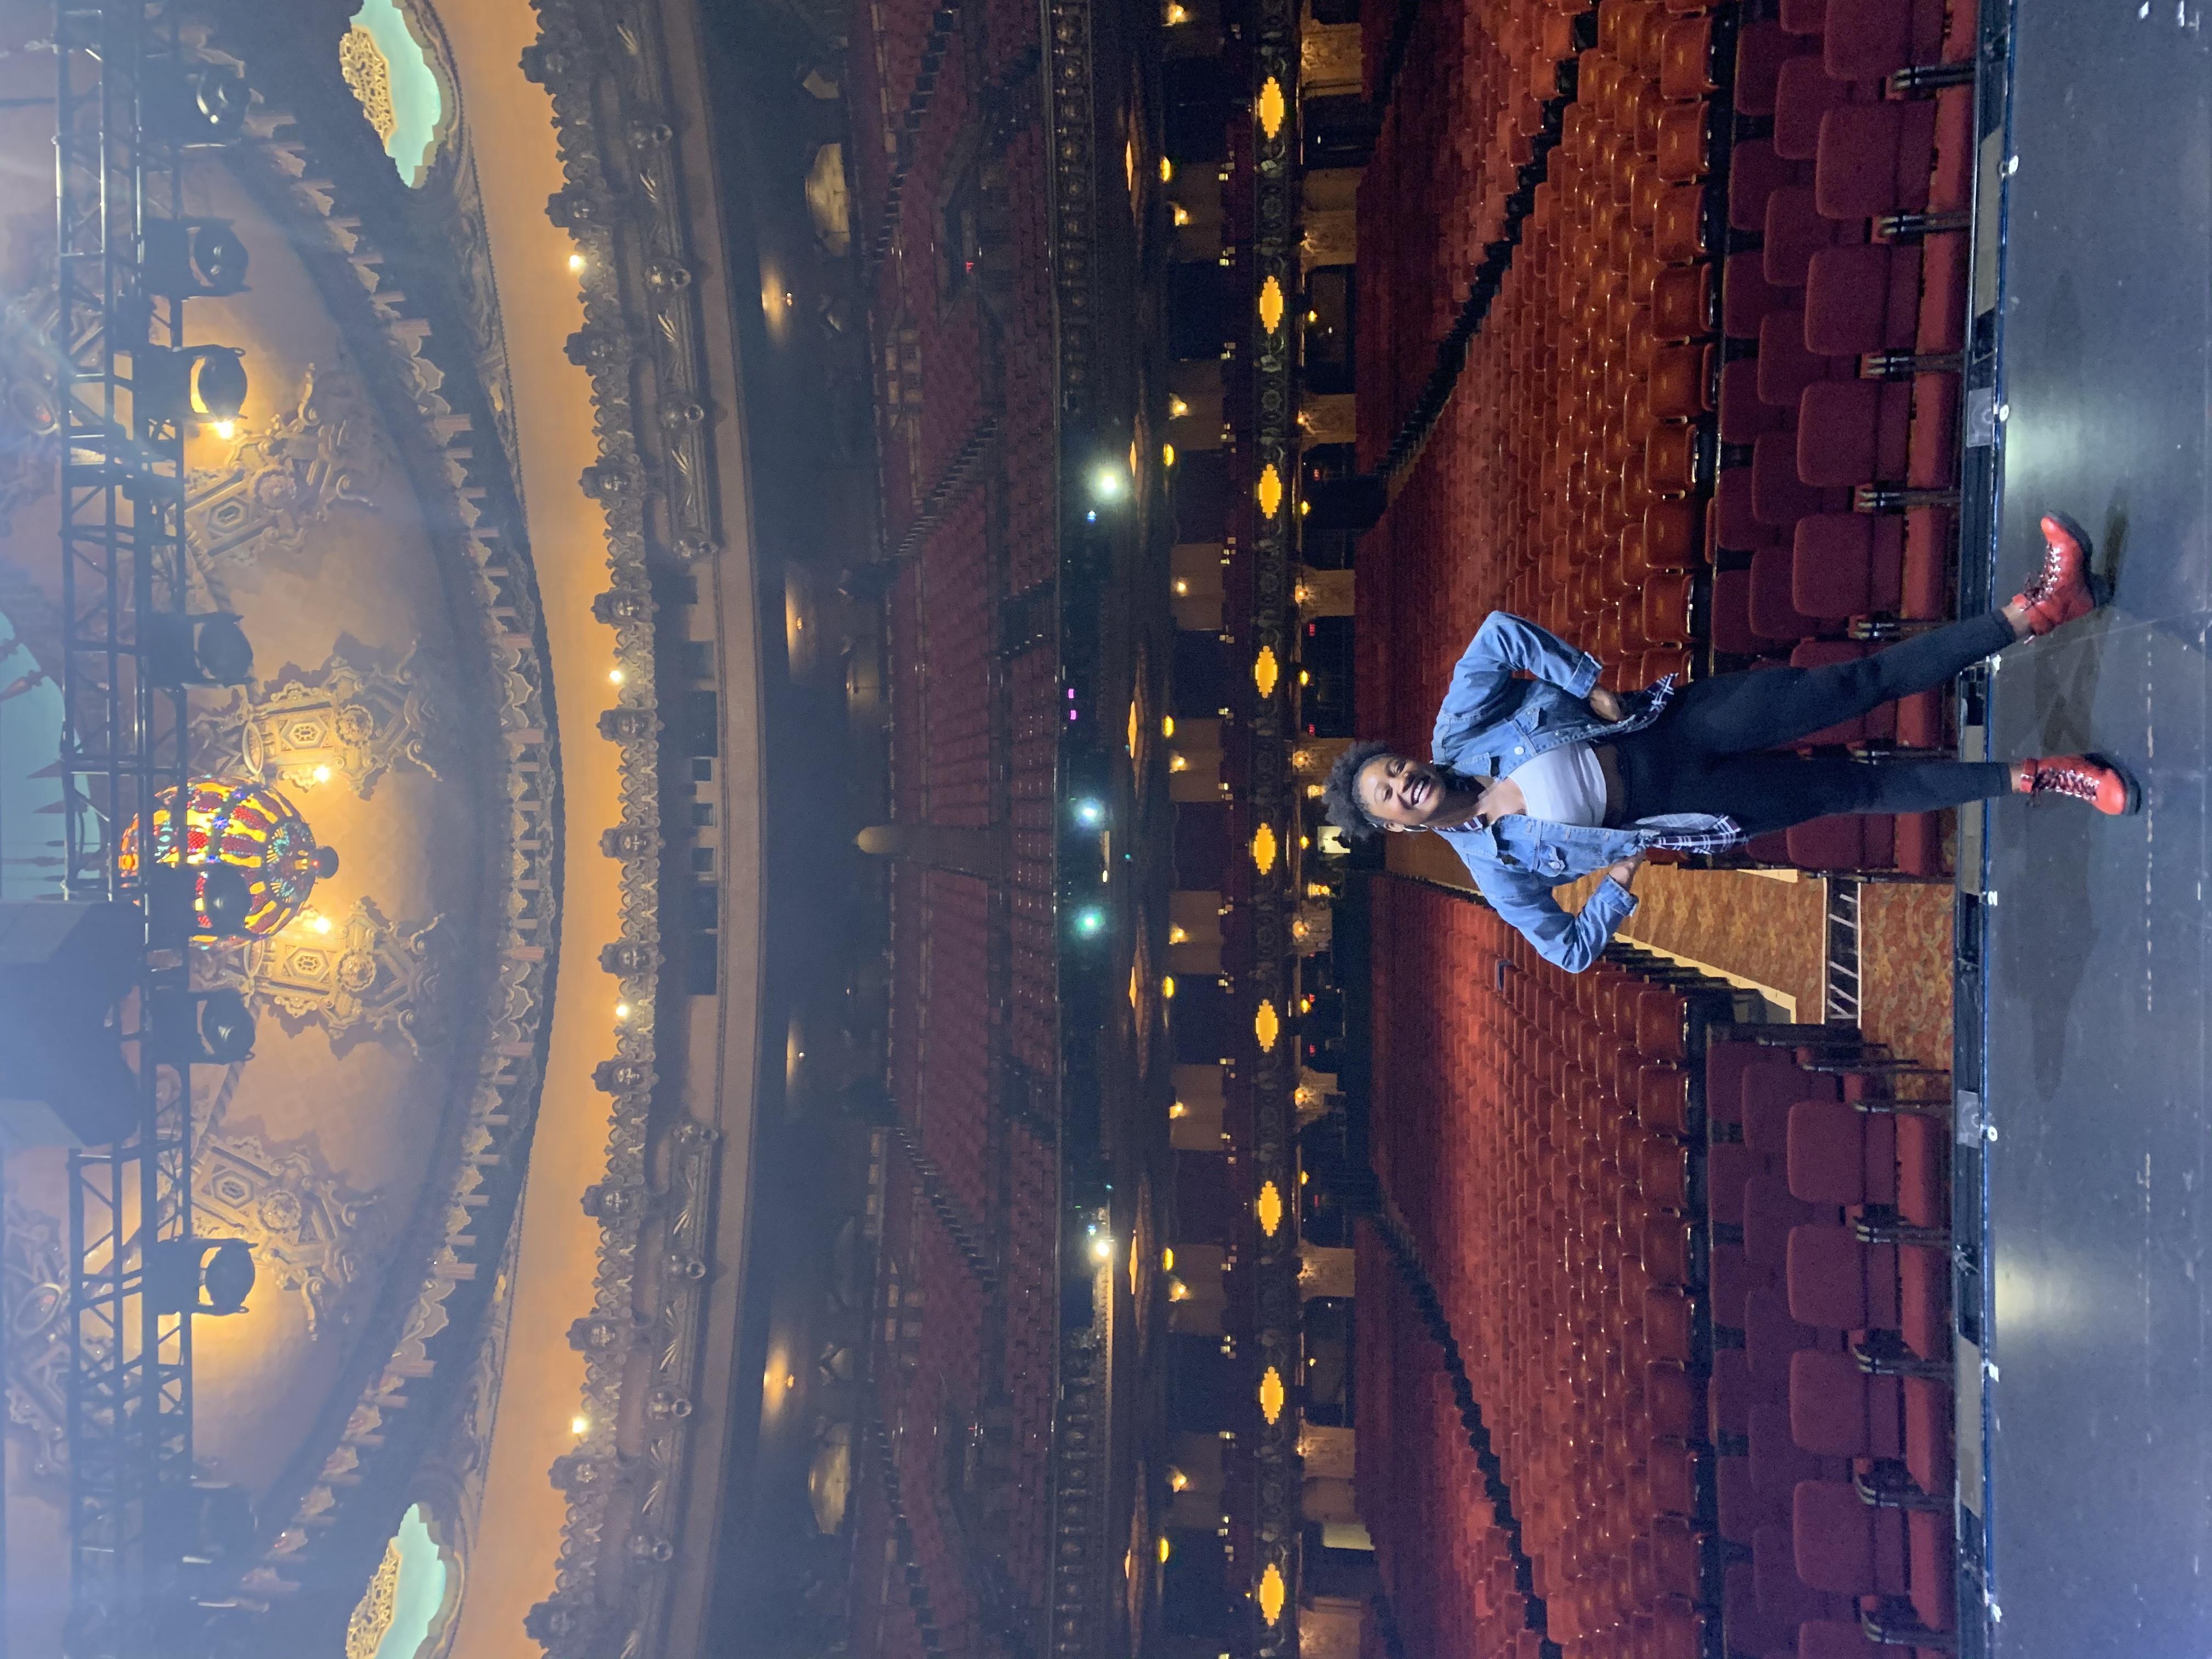 Ciara Alyse Harris between performances of the hit musical, Dear Evan Hansen